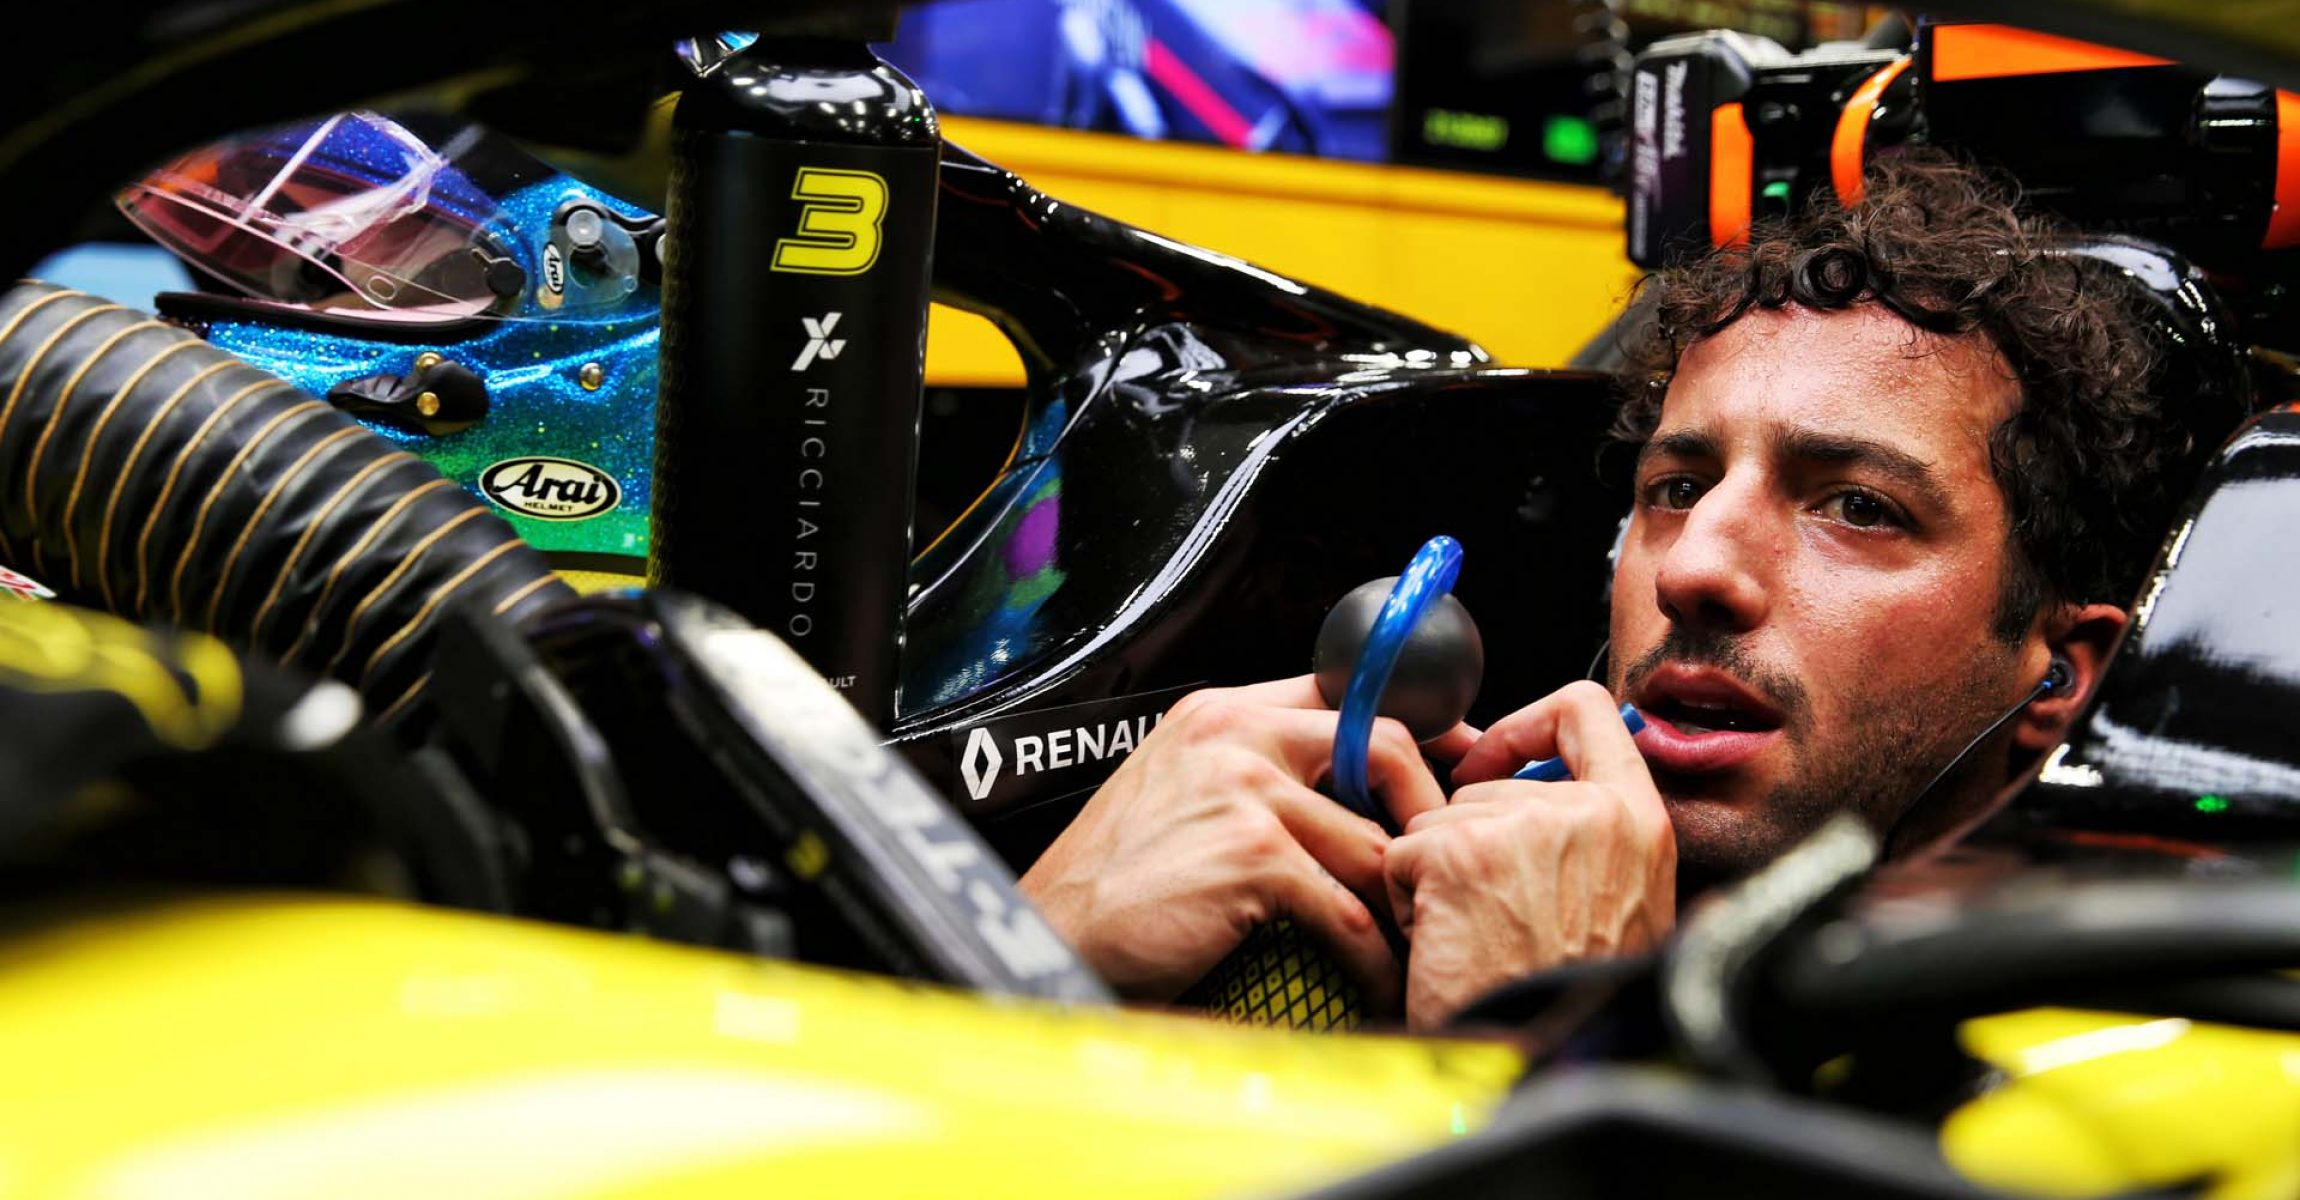 Daniel Ricciardo (AUS) Renault F1 Team RS19. Singapore Grand Prix, Friday 20th September 2019. Marina Bay Street Circuit, Singapore.